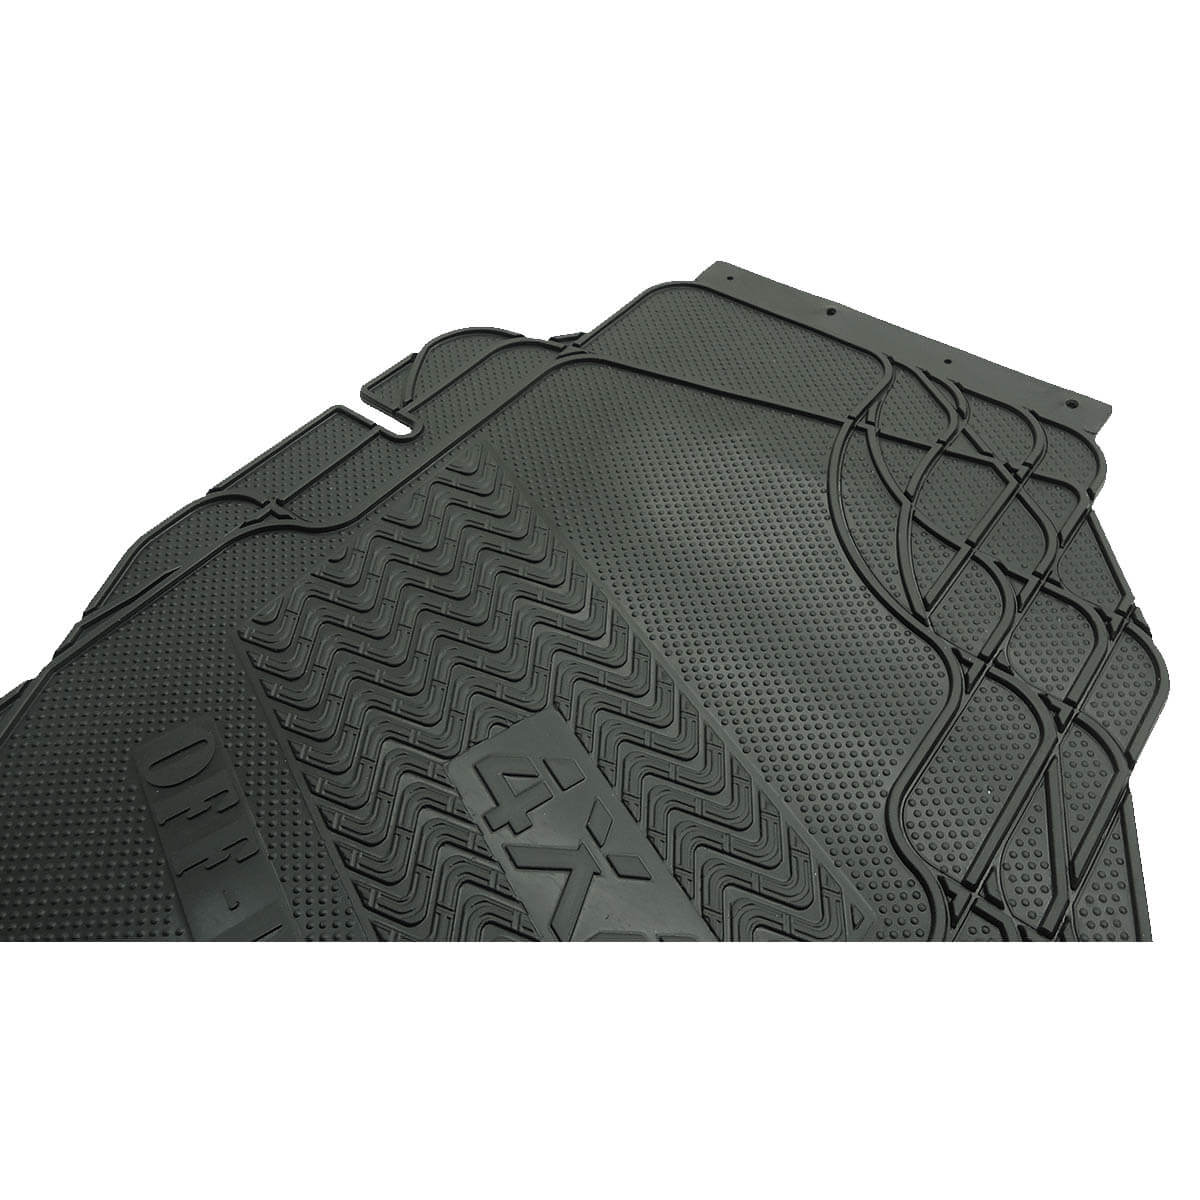 Tapete borracha PVC virgem Amarok cabine dupla 2011 a 2021